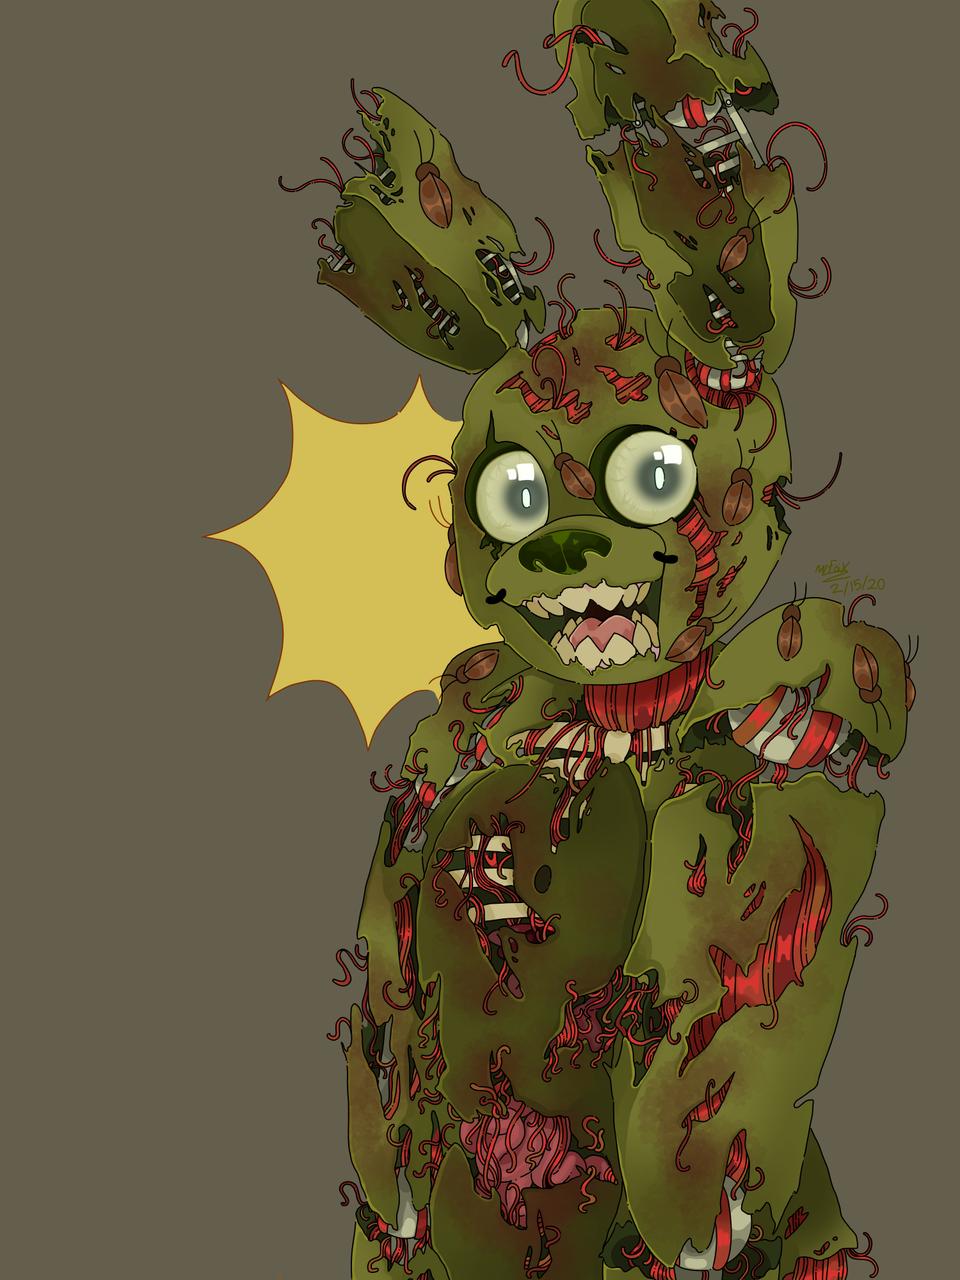 pooptrap Illust of BunnyBrainz medibangpaint springtrap FiveNightsatFreddy's